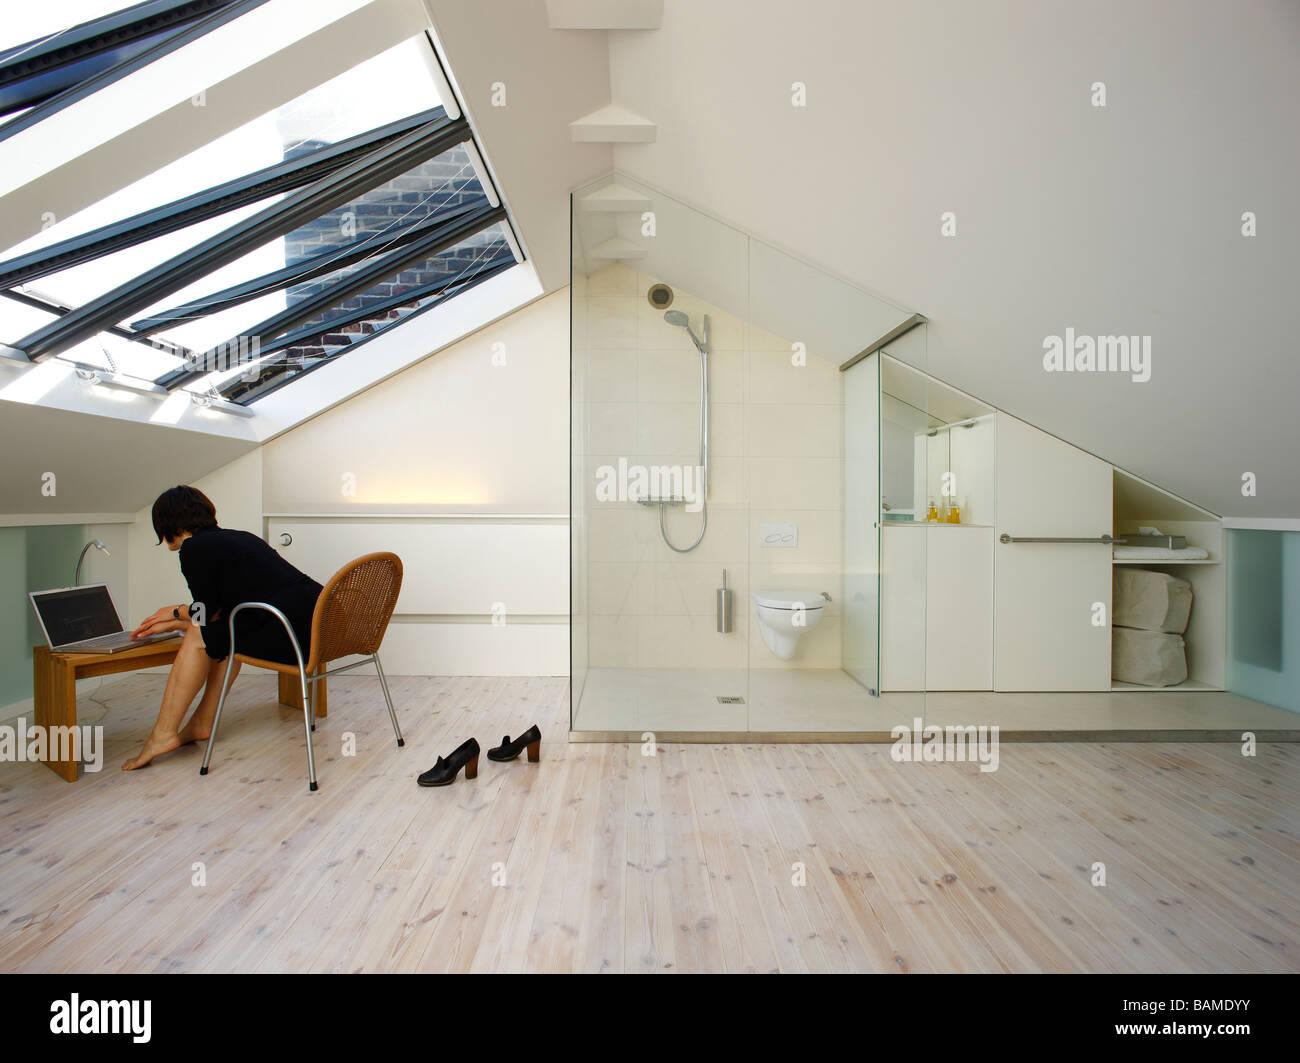 PRIVATE HOUSE, ULLMAYER SYLVESTER ARCHITECTS, LONDON, UNITED KINGDOM Stock Photo